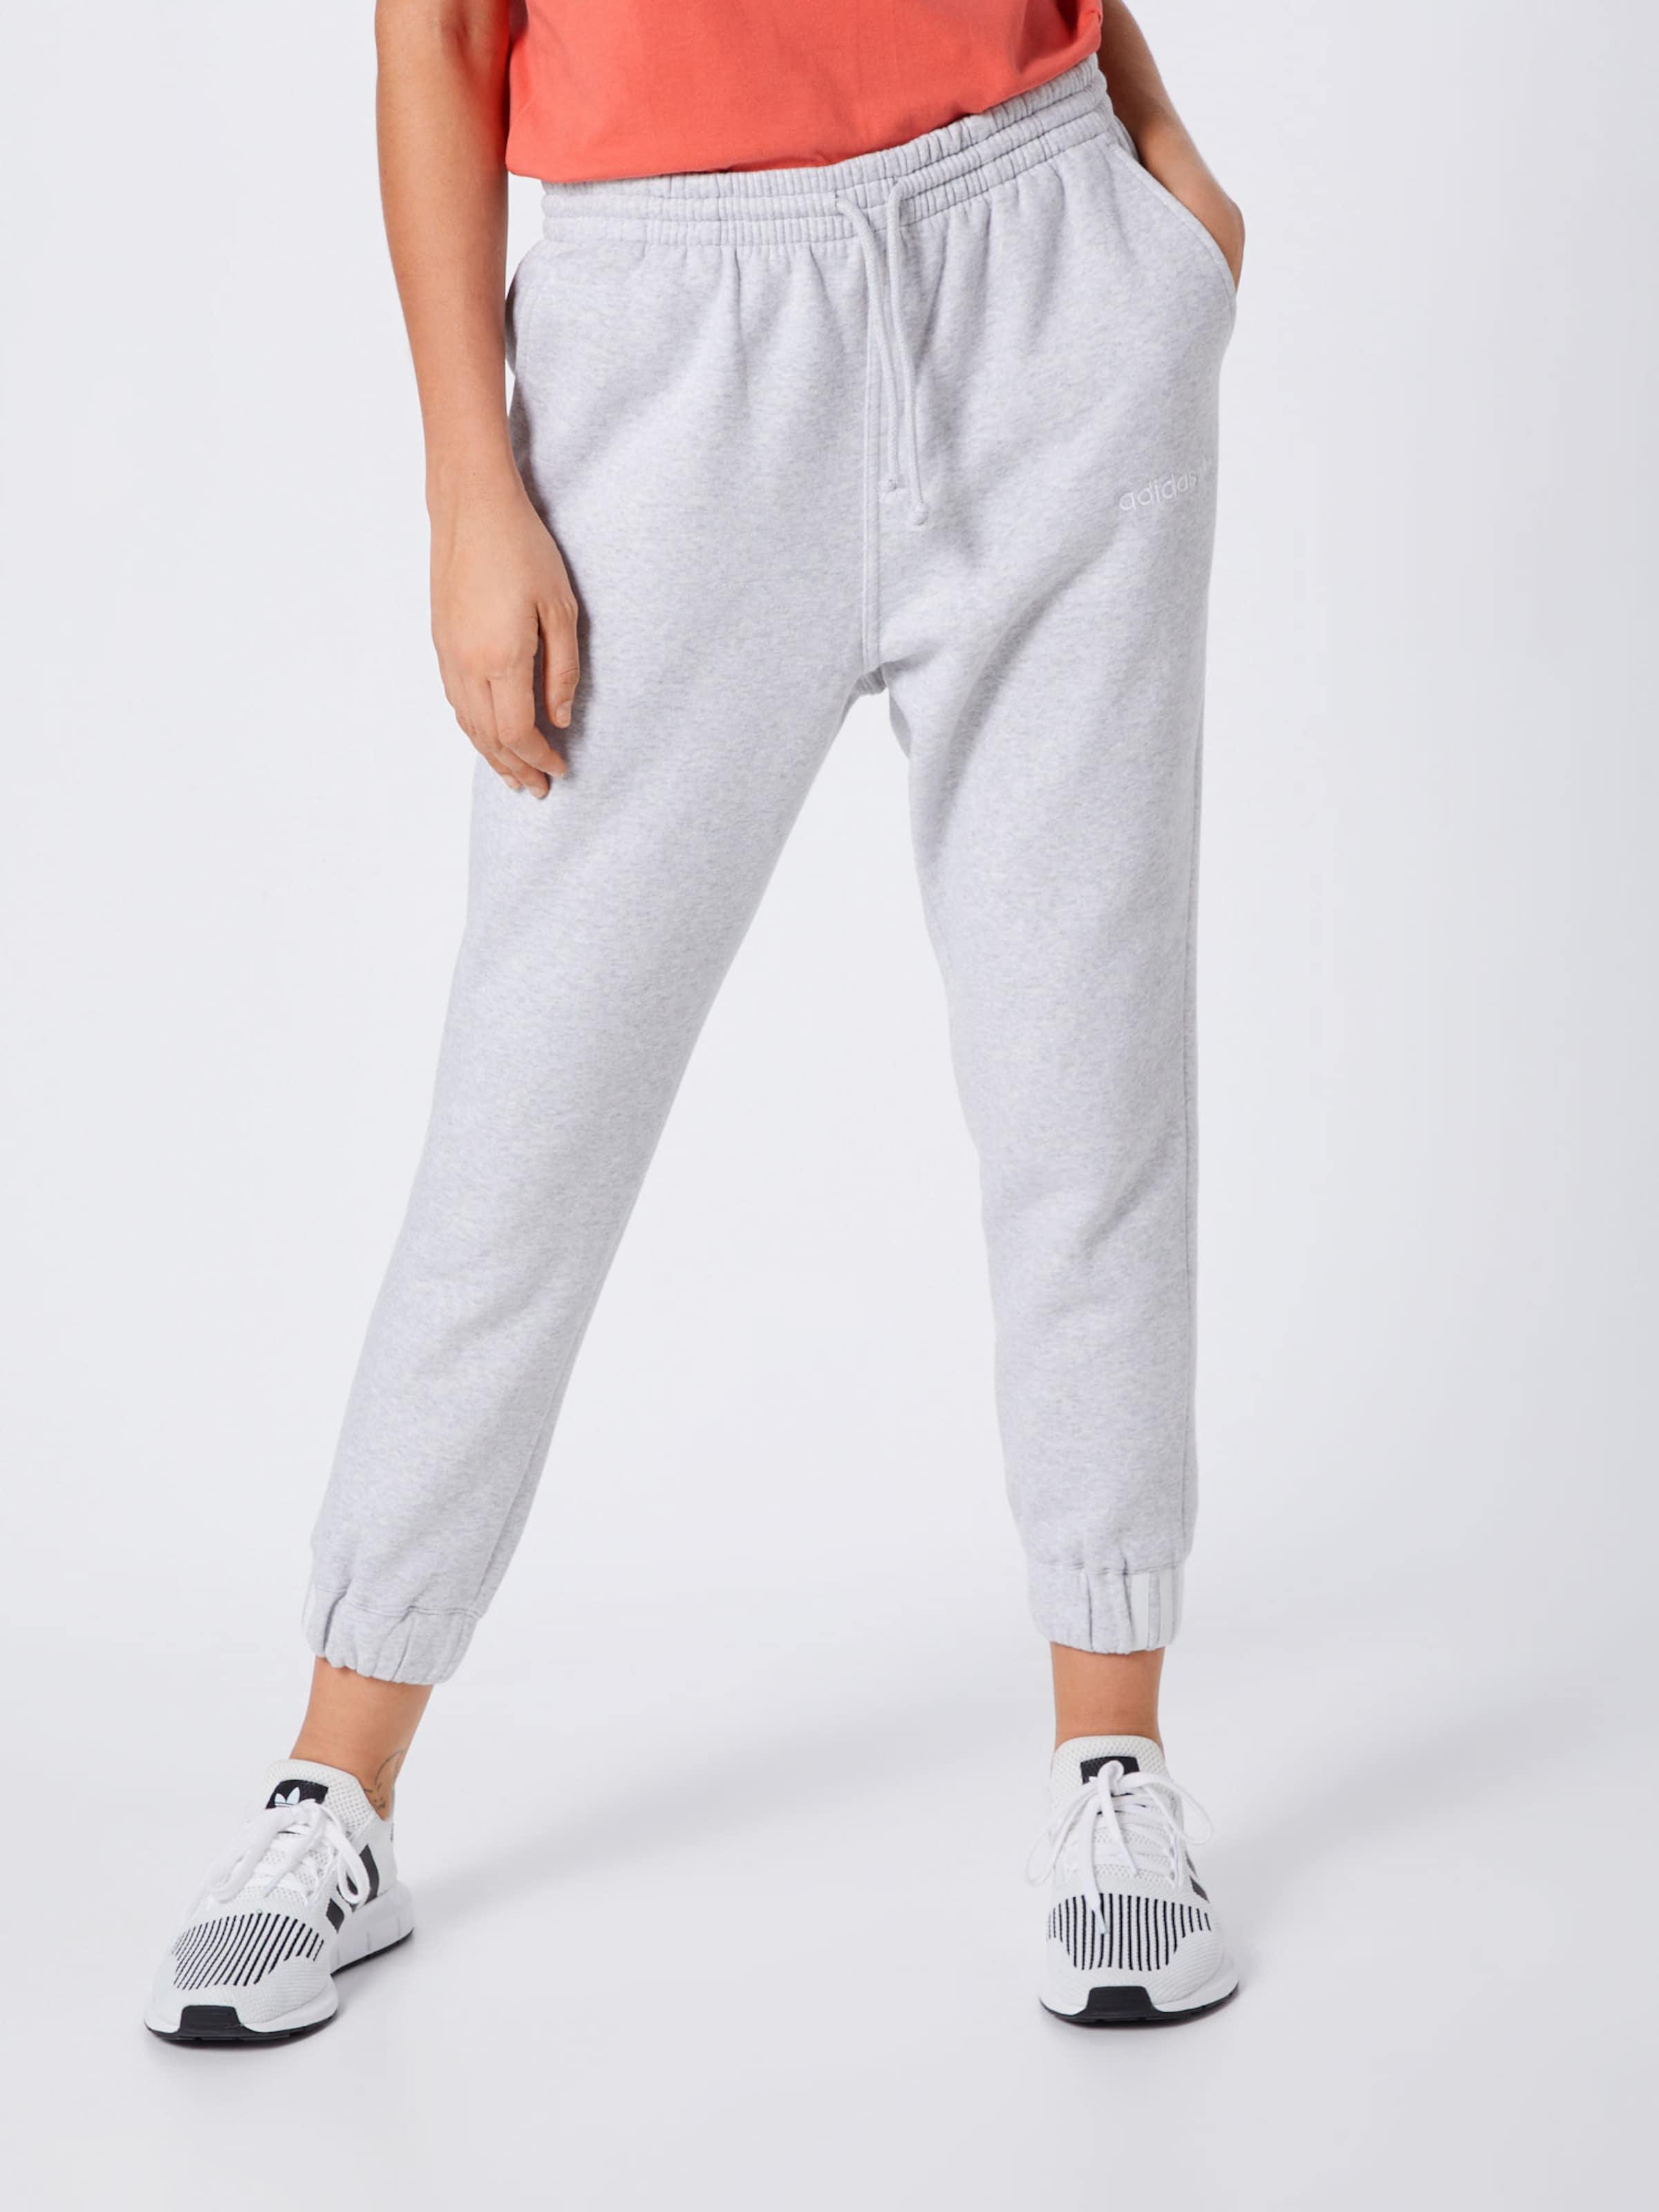 Gris Chiné En Originals Adidas Pantalon 'coeeze' 4jq5RLc3SA